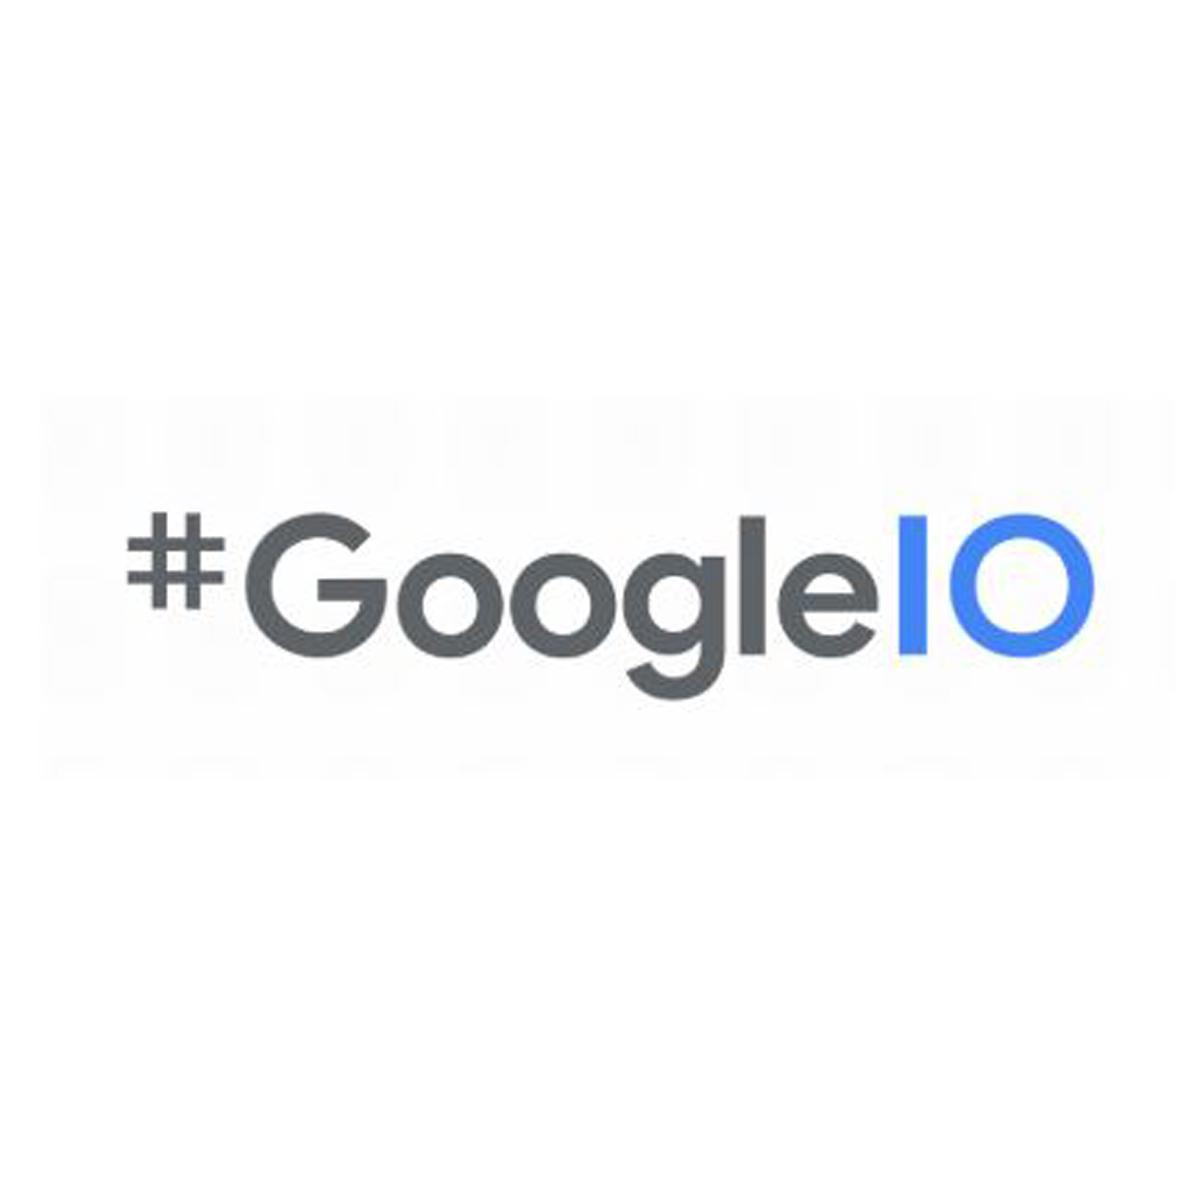 Google I/Oは完全中止。オンライン配信もキャンセルへ